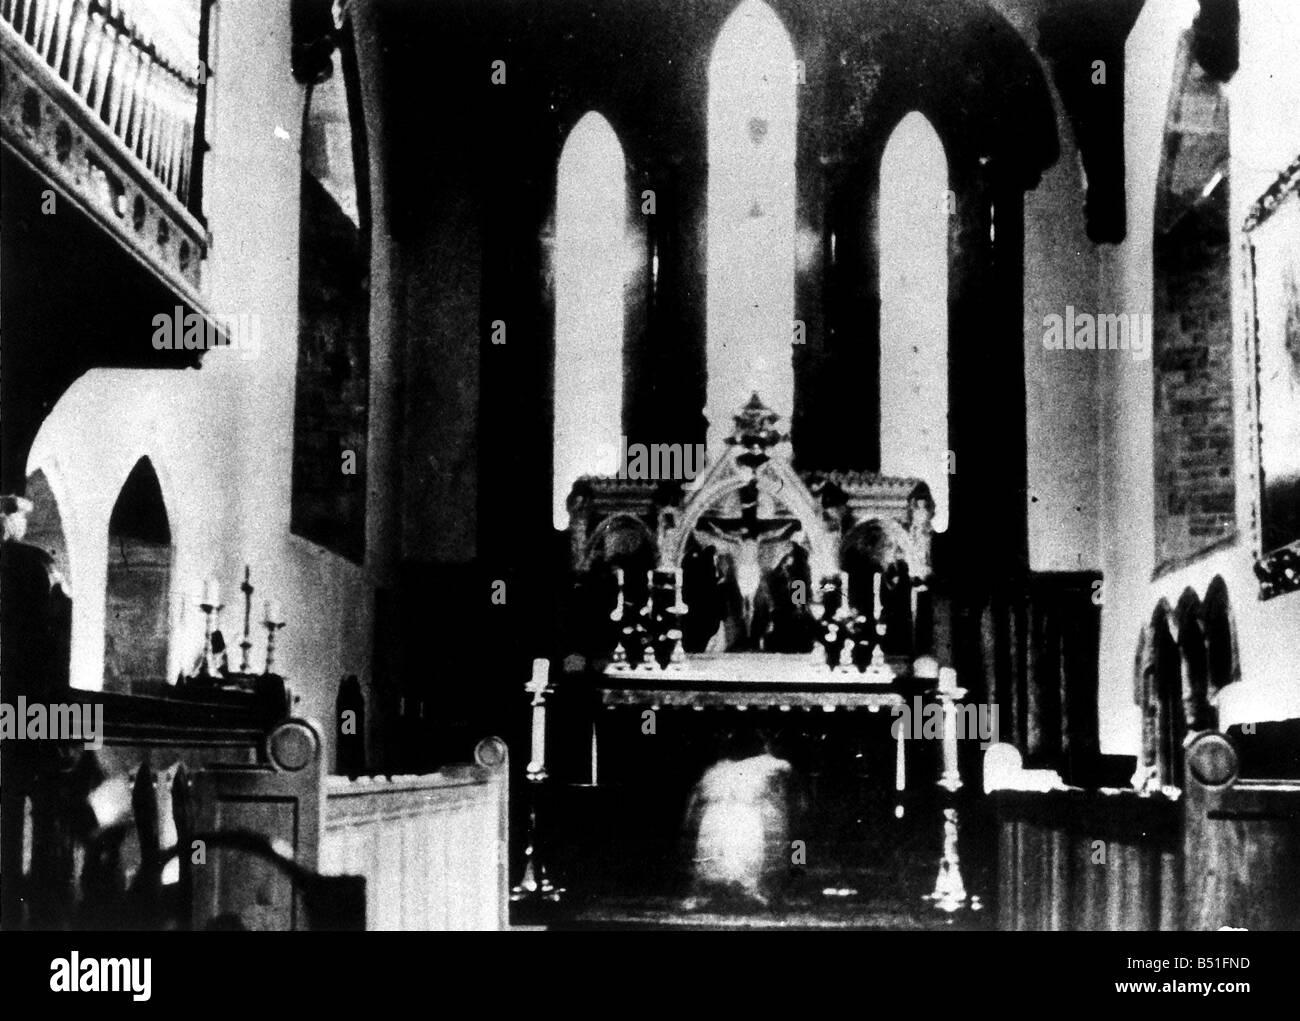 Ghost monk kneeling at altar - Stock Image